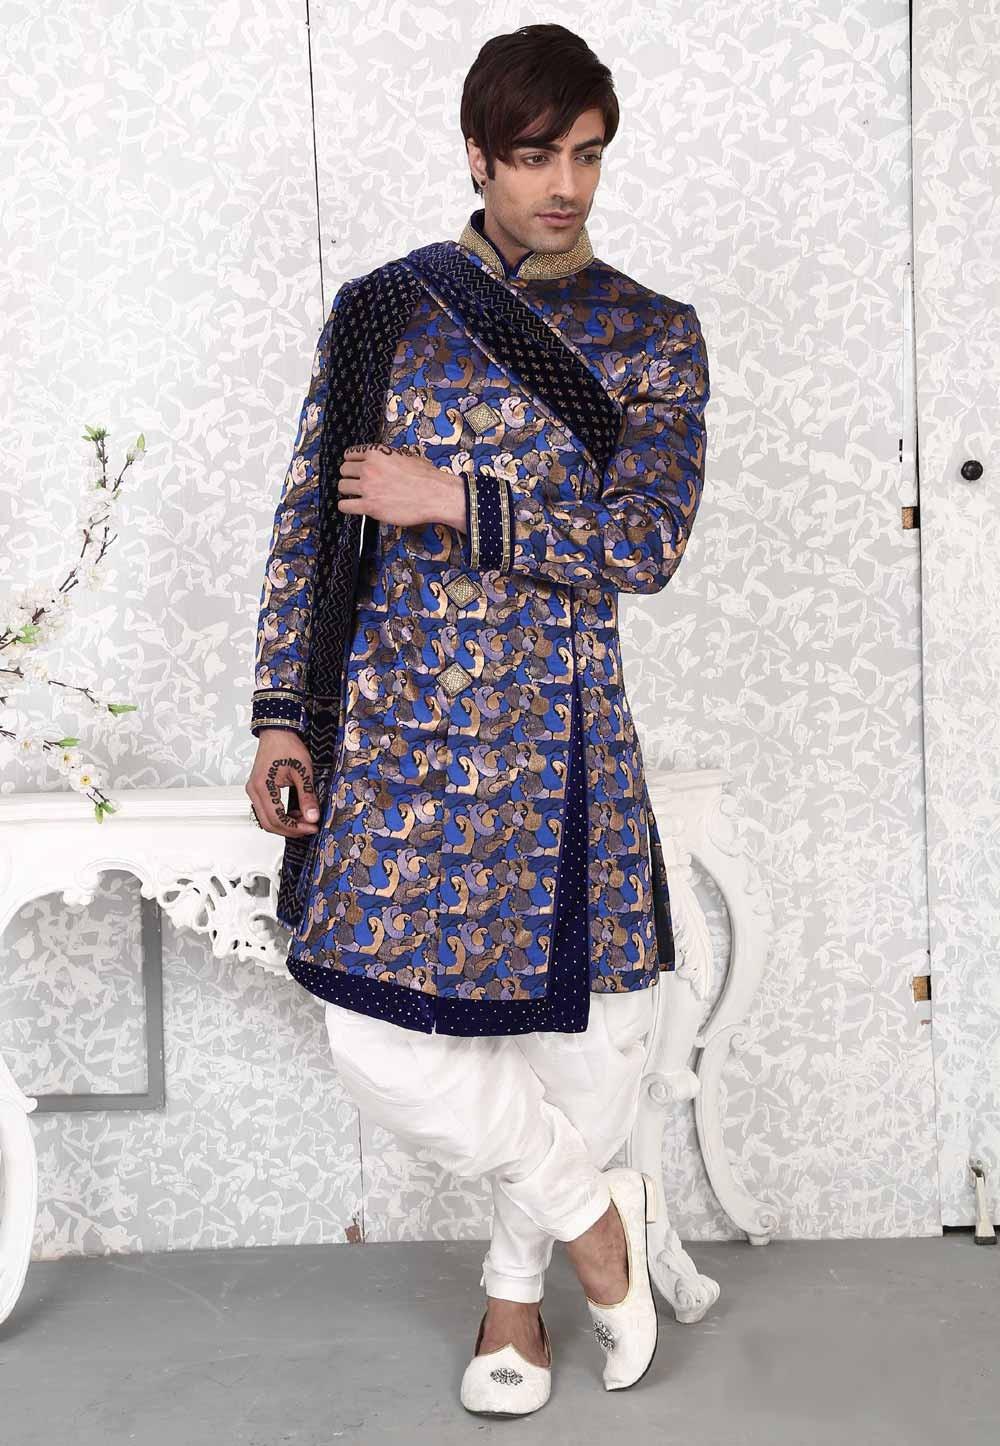 Velvet,Brocade Fabric Royal Blue Men's Indo Western